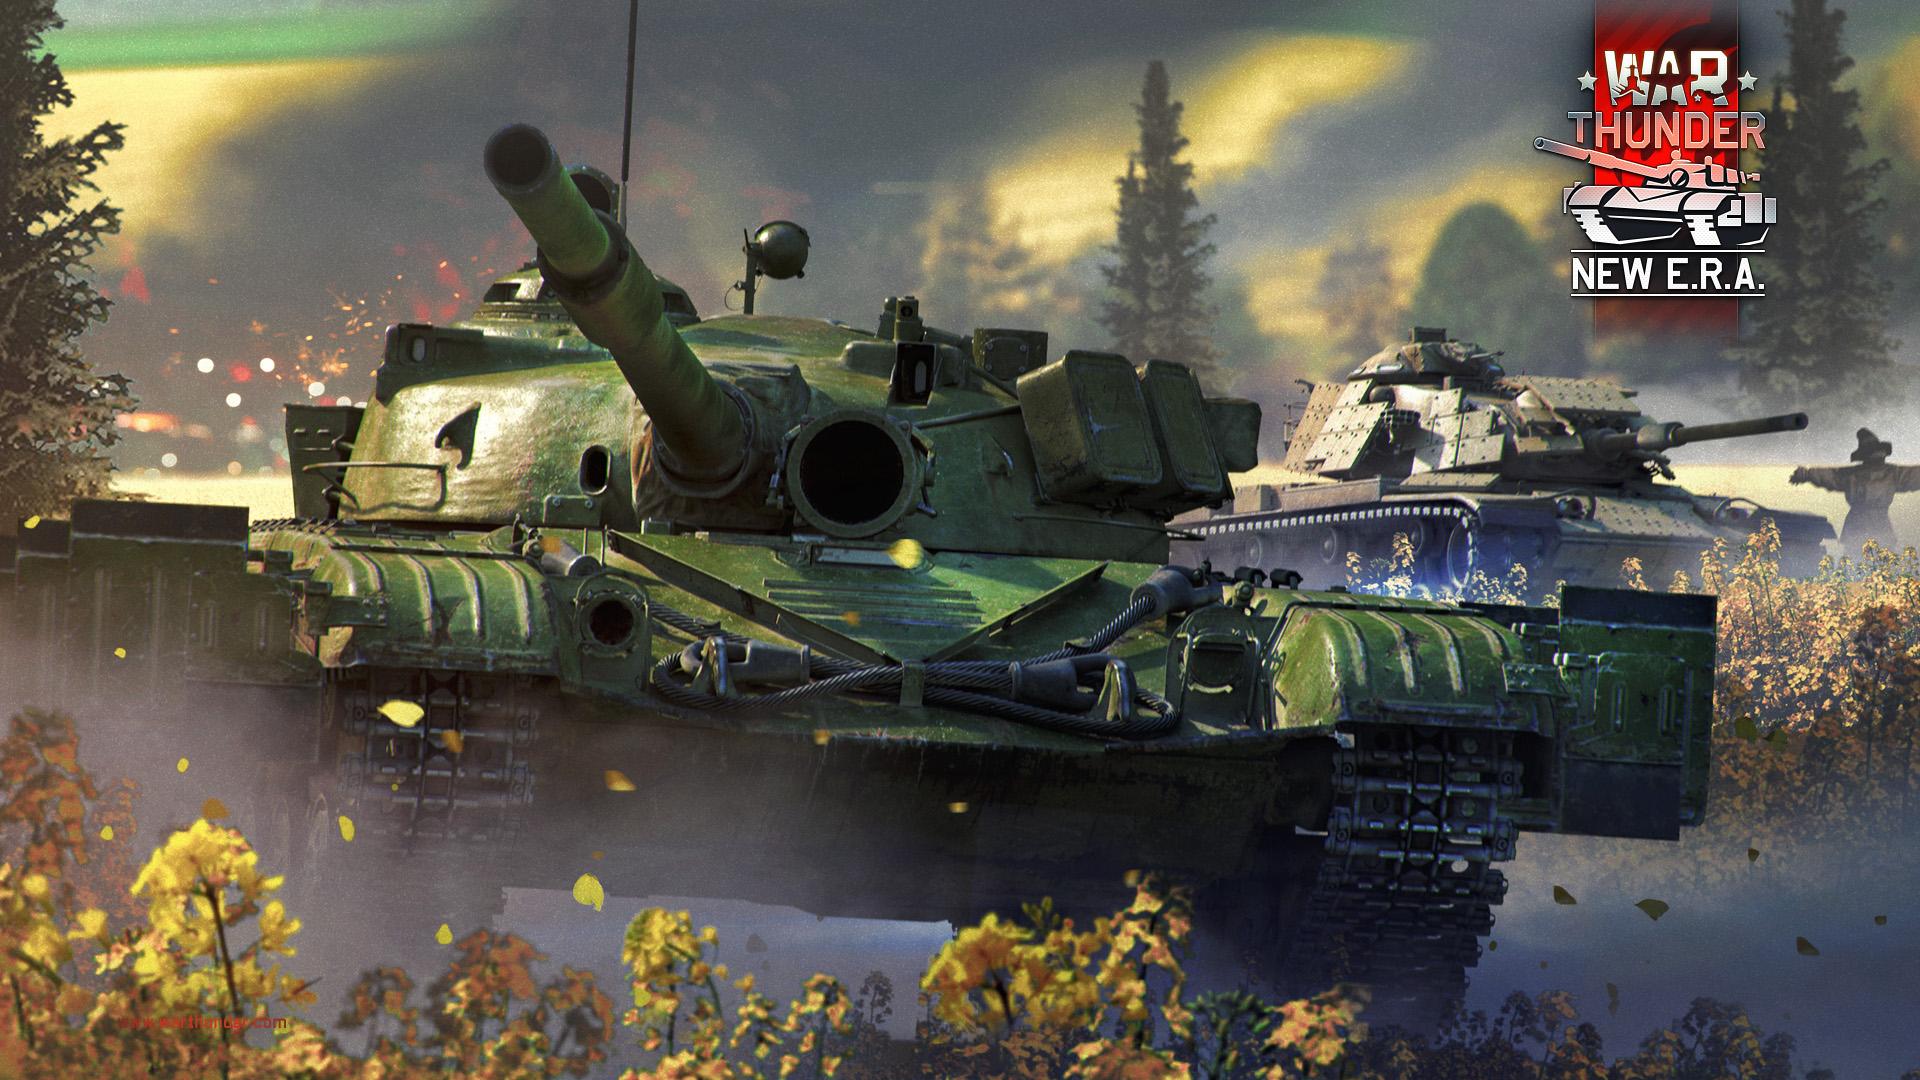 Update 1.71 'New E.R.A' released! - News - War Thunder